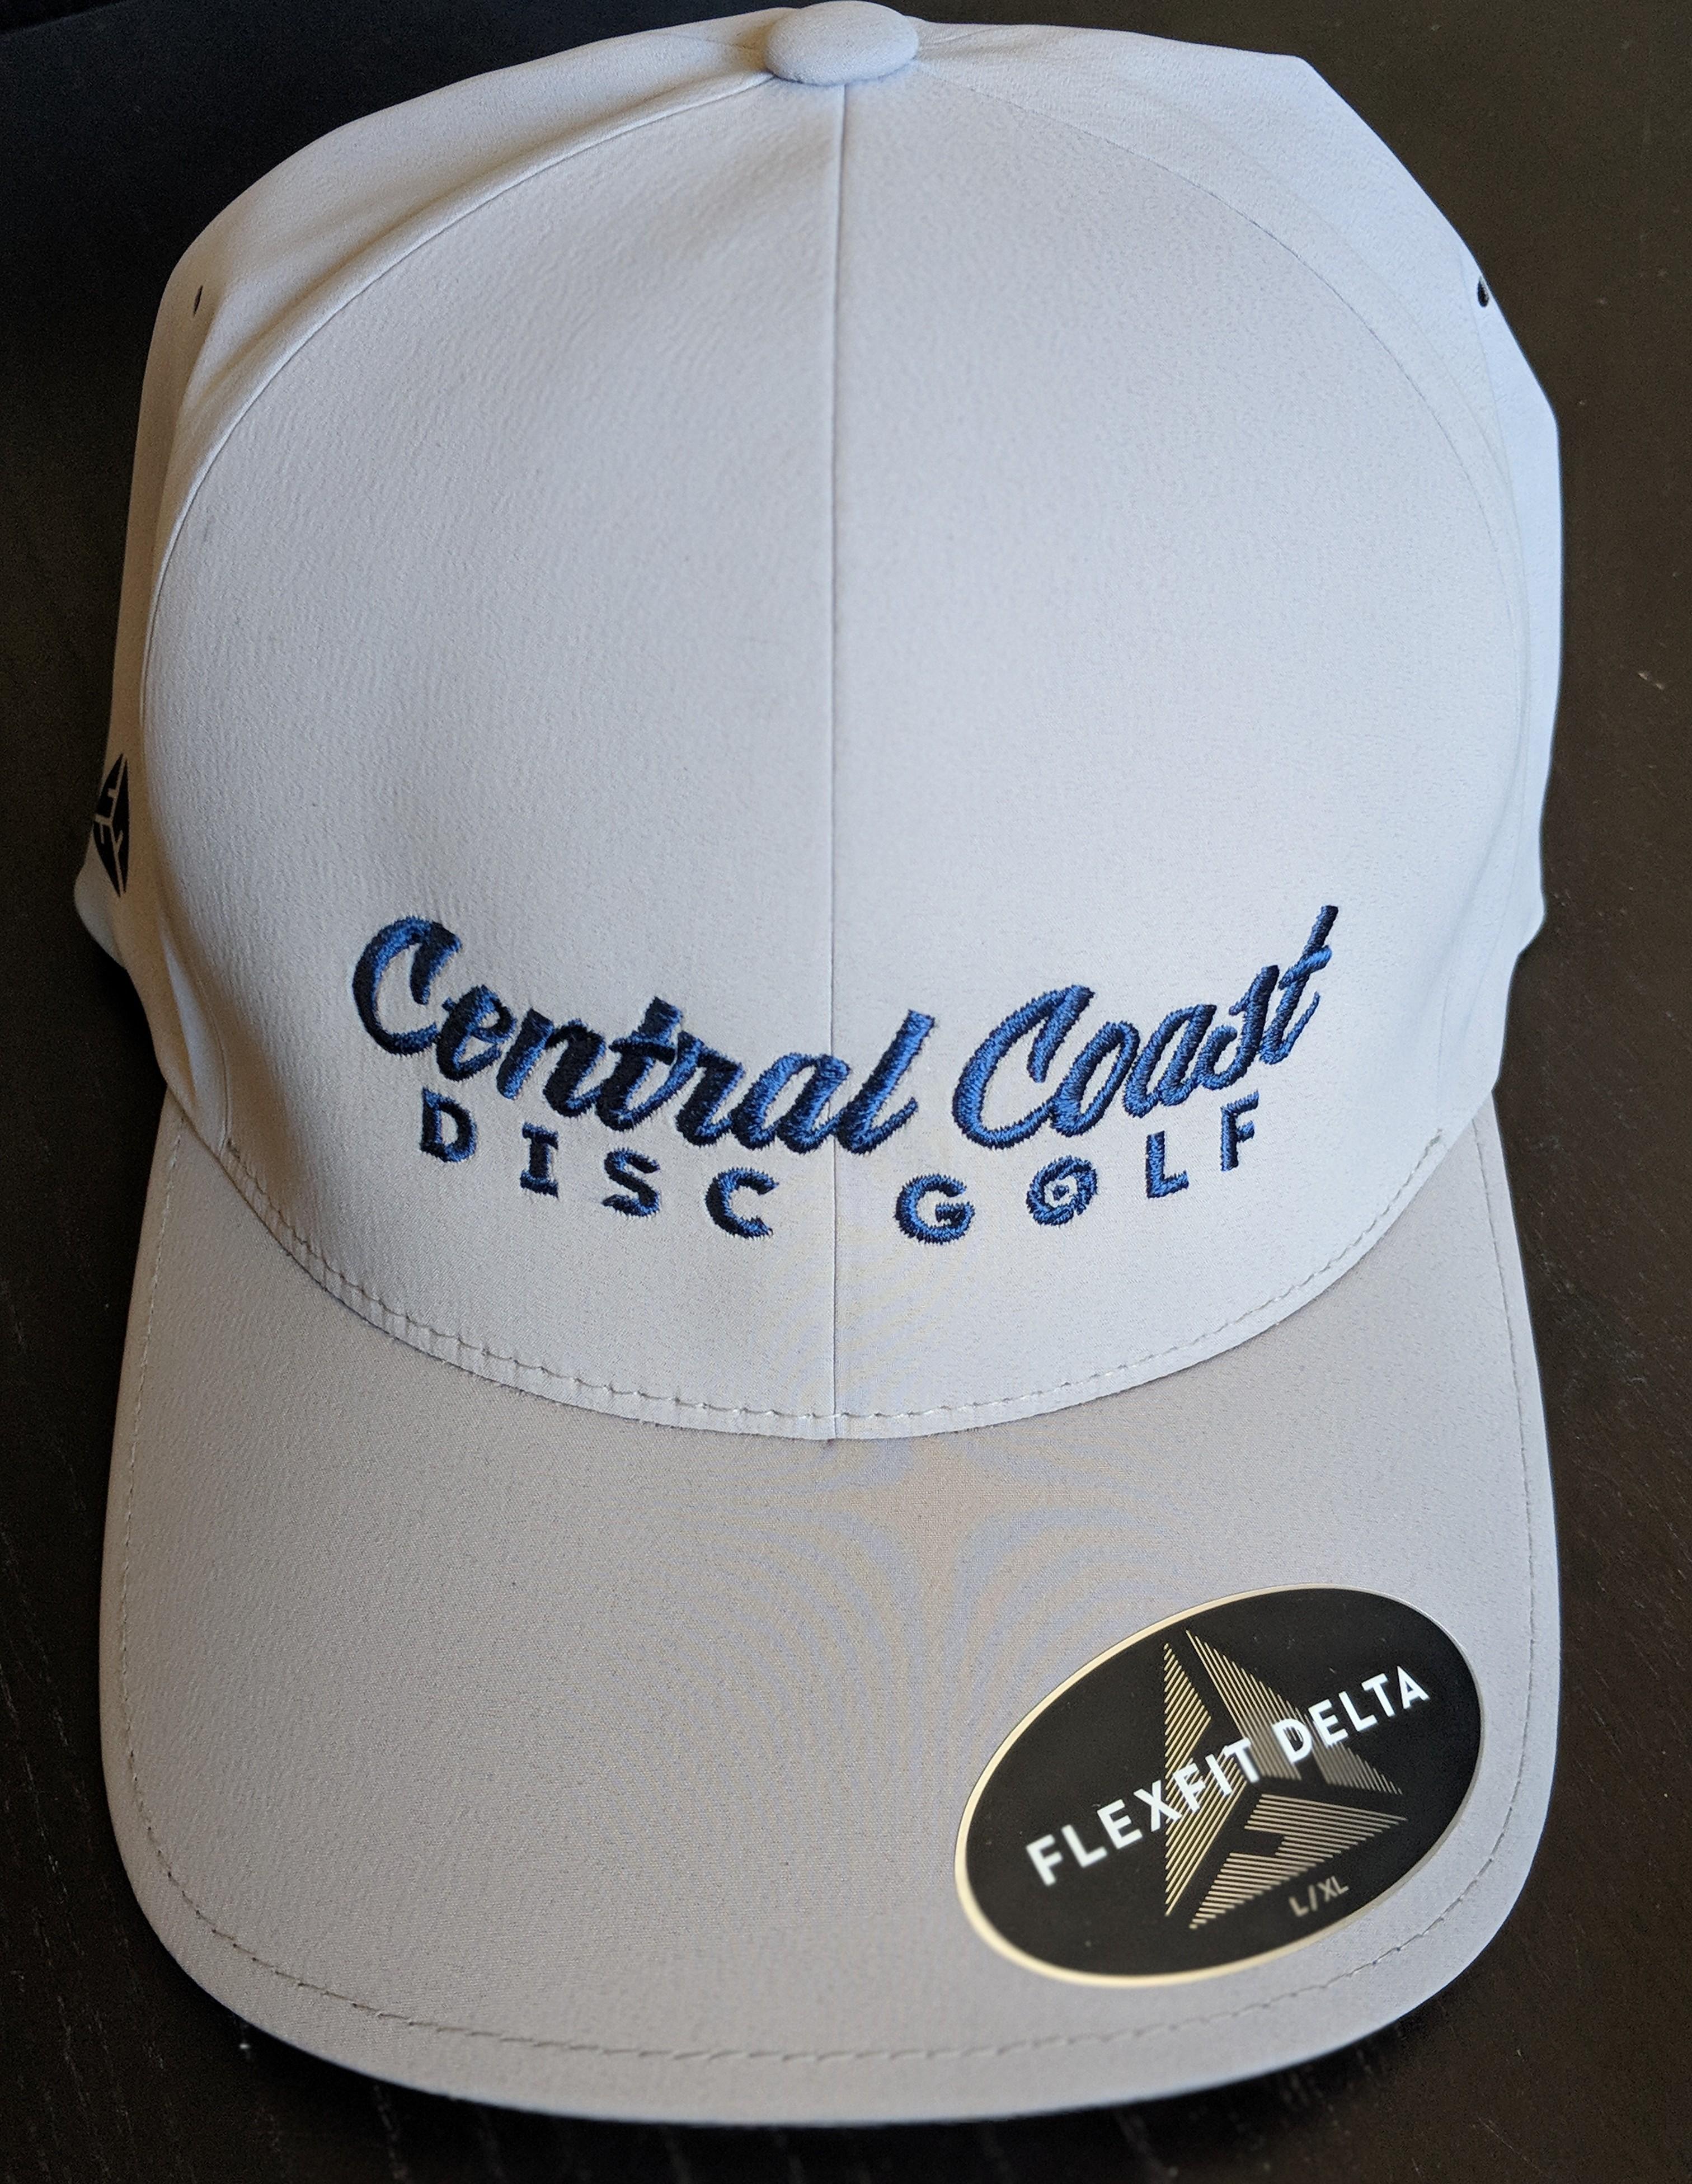 CCDG Flexfit Delta Hat - Black or Silver